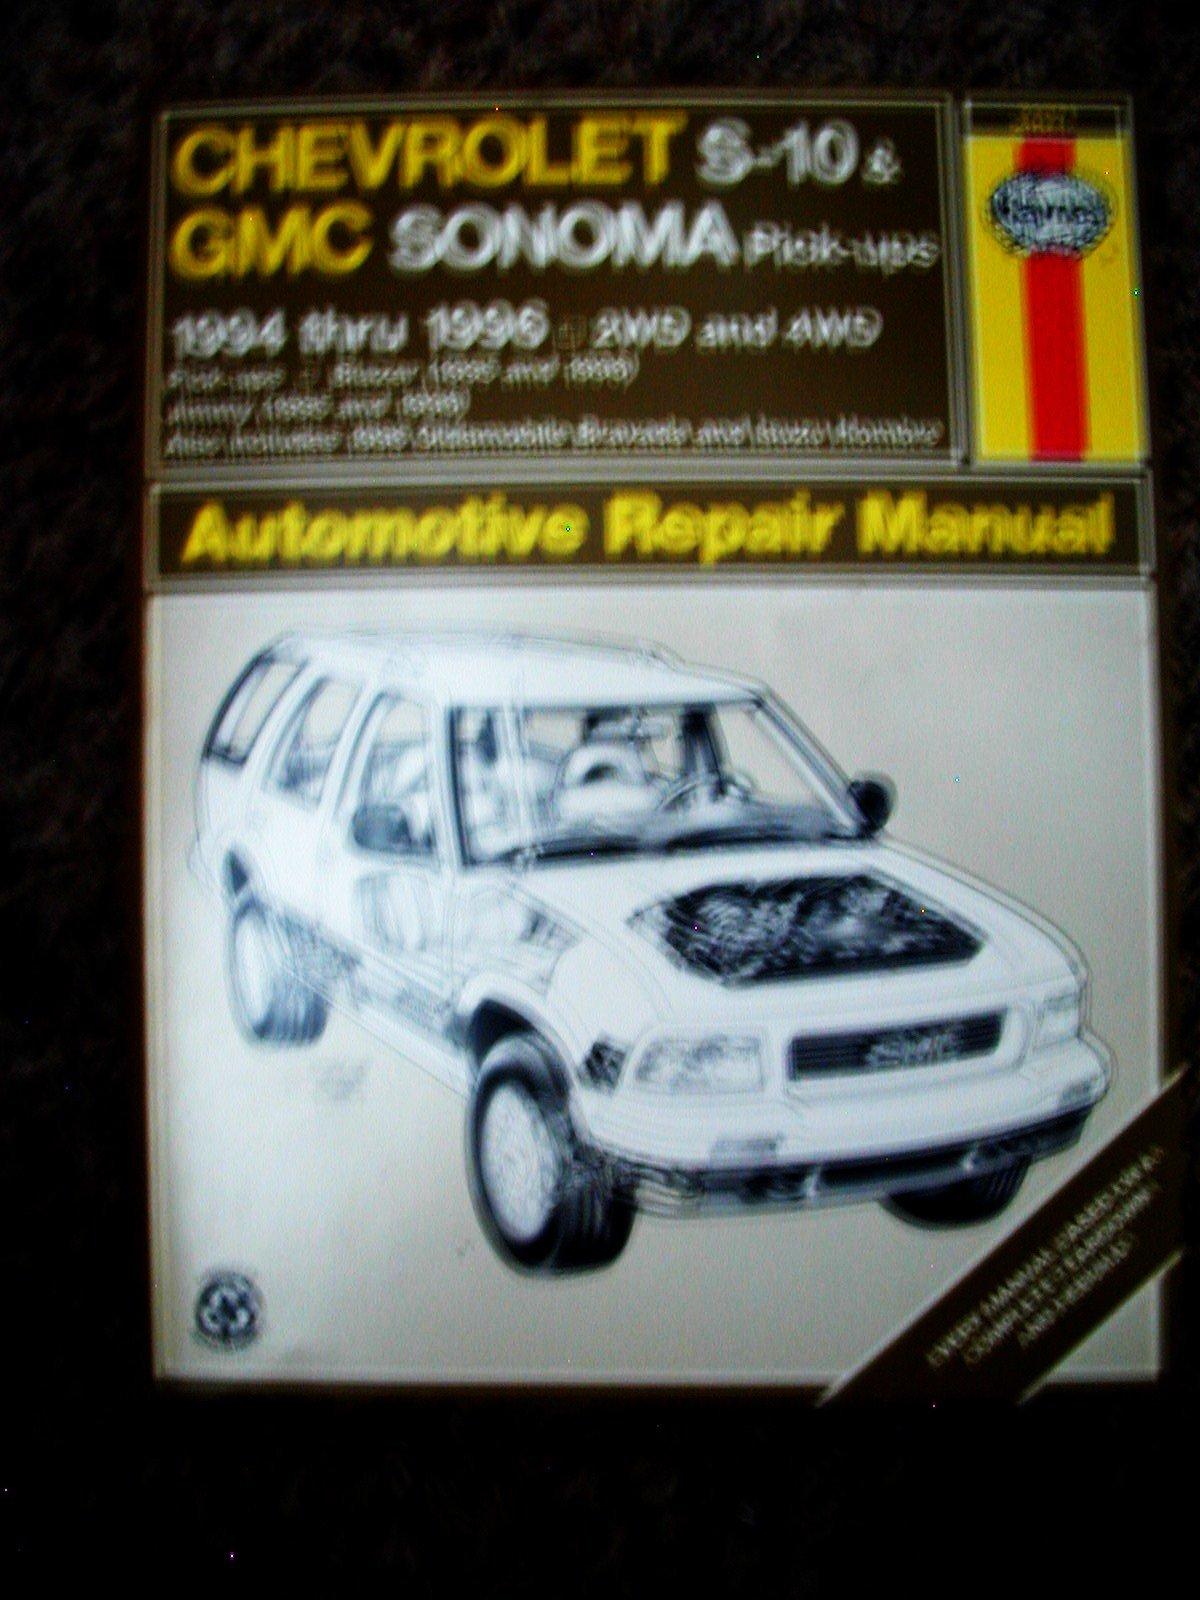 Chevrolet S-10 & Blazer Gmc Sonoma & Jimmy Oldsmobile Bravada Isuzu Hombre:  1994-96 Automotive Repair Manual (Haynes Auto Repair Manuals Series):  Robert ...